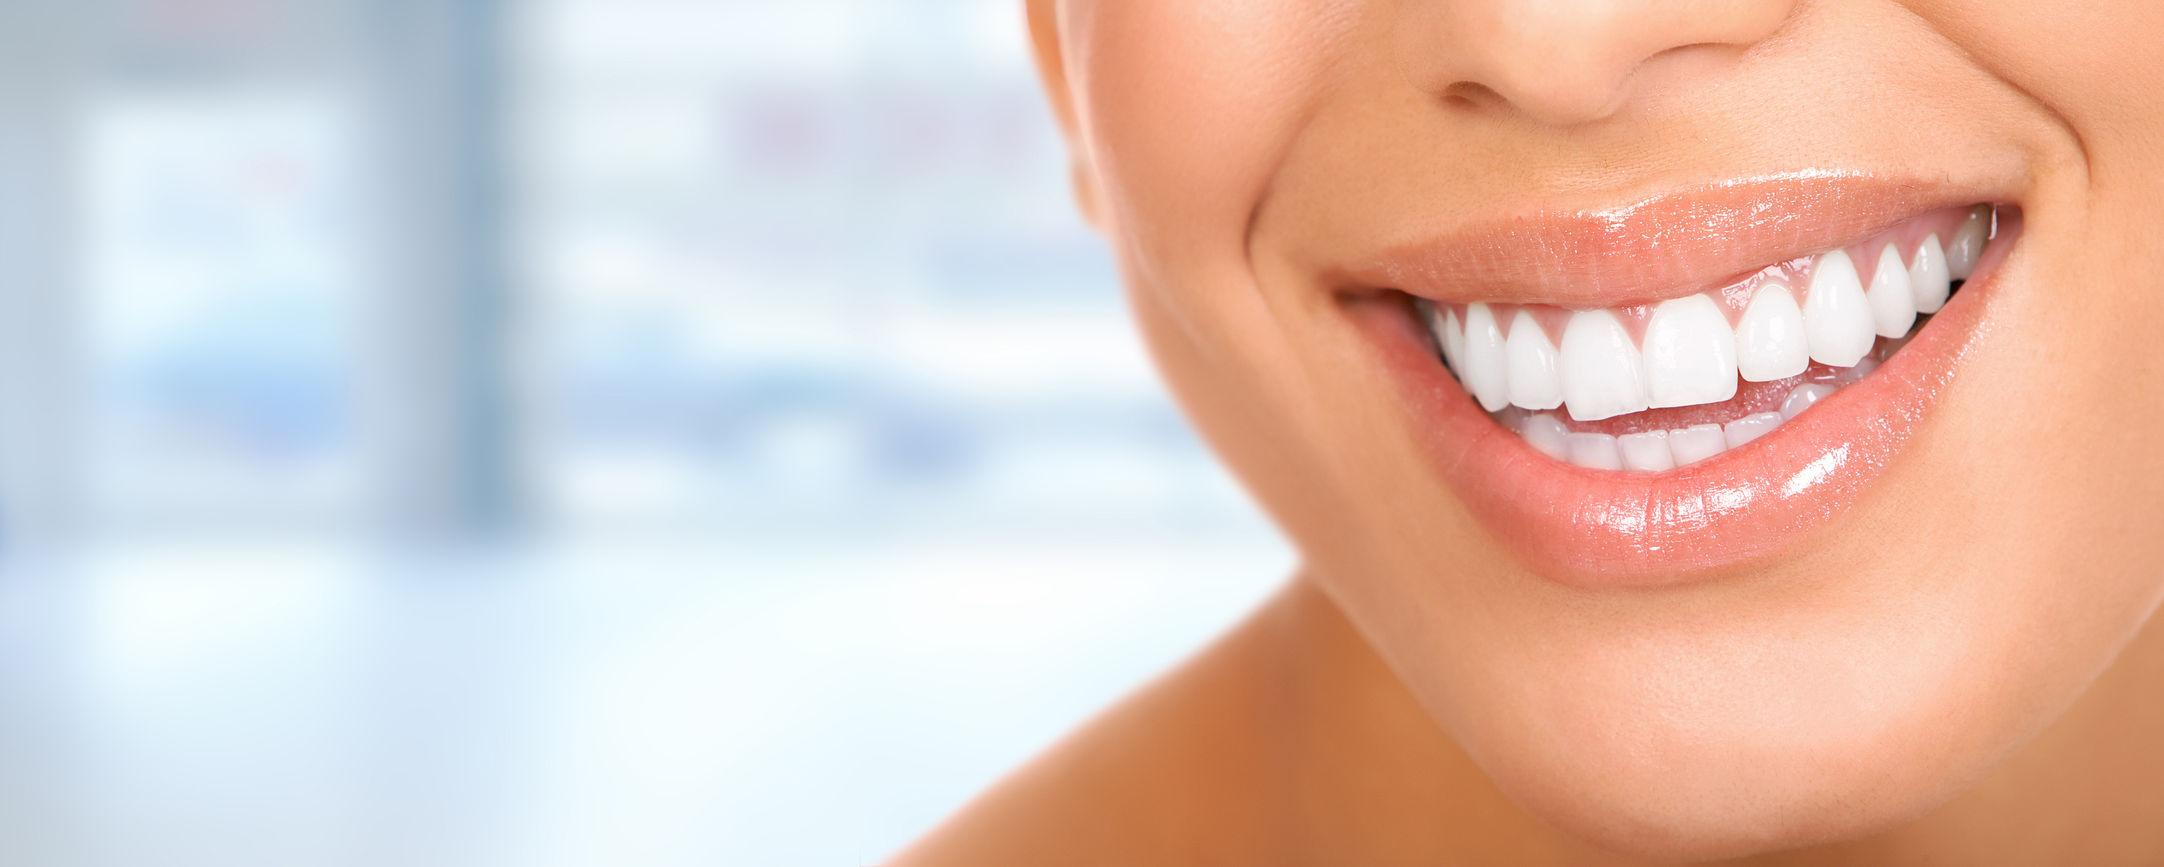 Zahntechnik Sollinger - lächeln